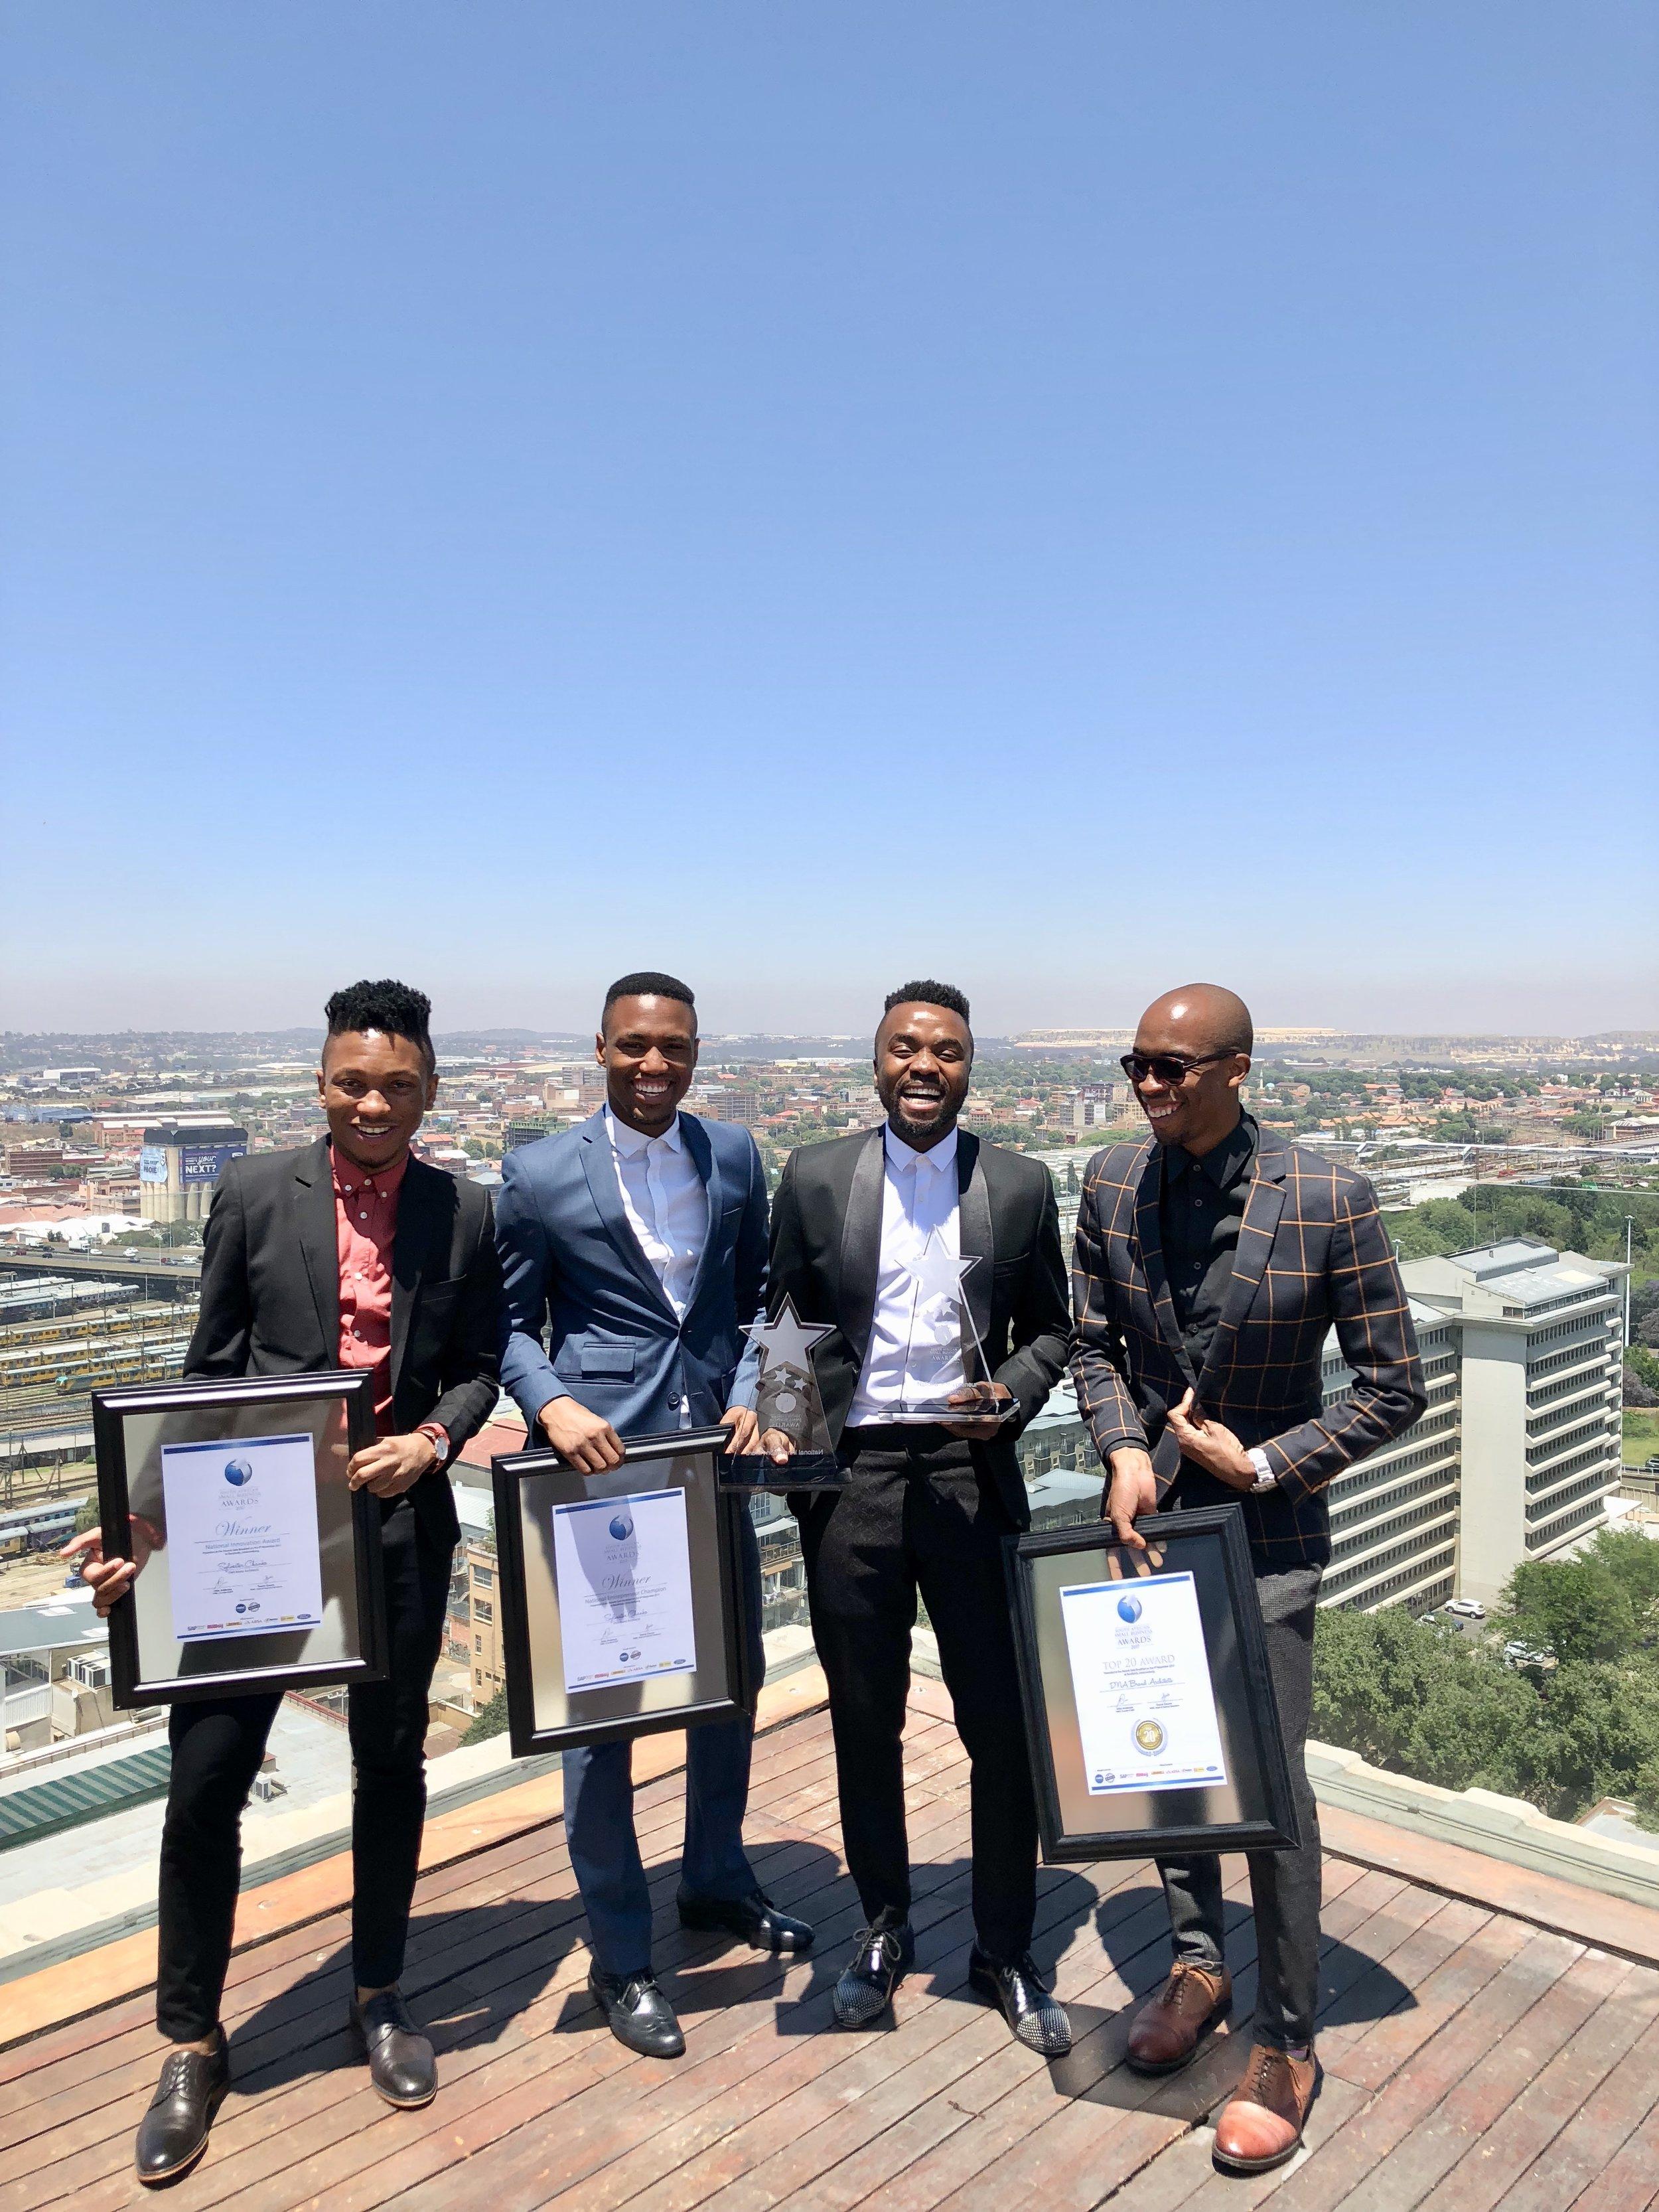 DNA team - Kutloano_Dingaan, Cedrick_Diphoko, Sylvester_Chauke,Vincent_Zondo.jpg